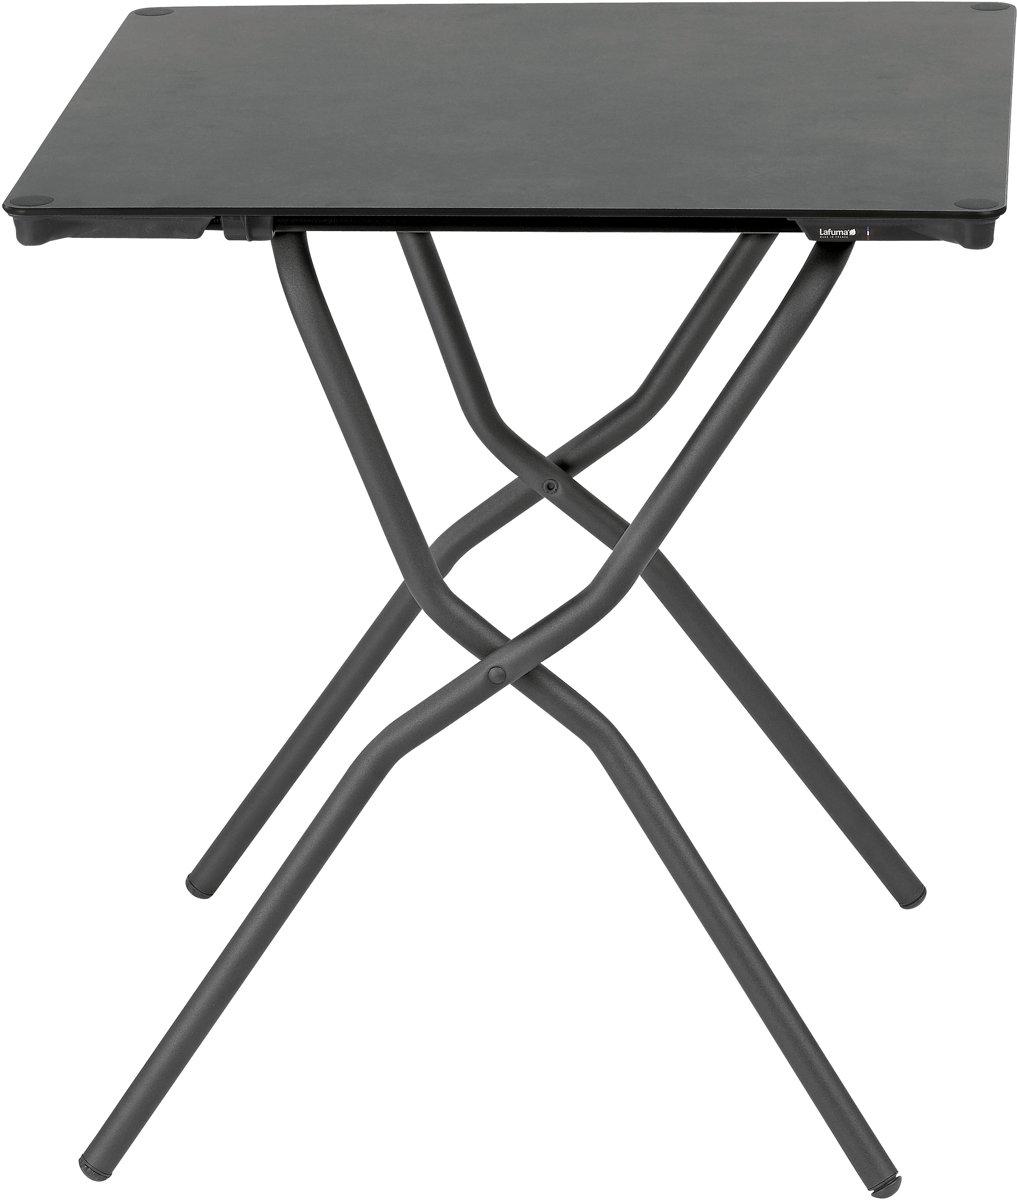 Lafuma mobilier anytime campingtafel - vierkant